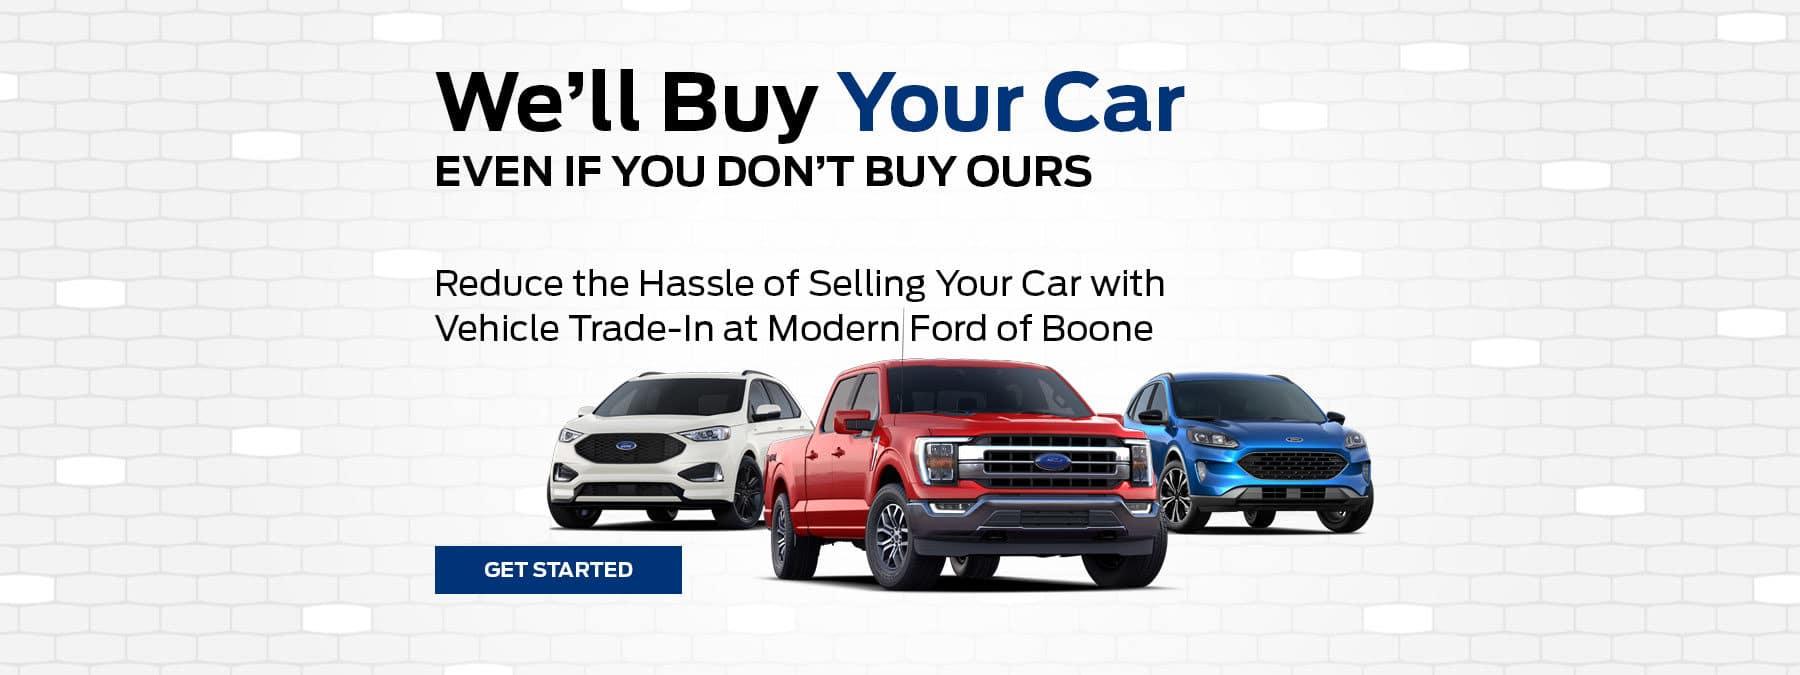 MDFB-BuyCar-SL Banner 1800X675